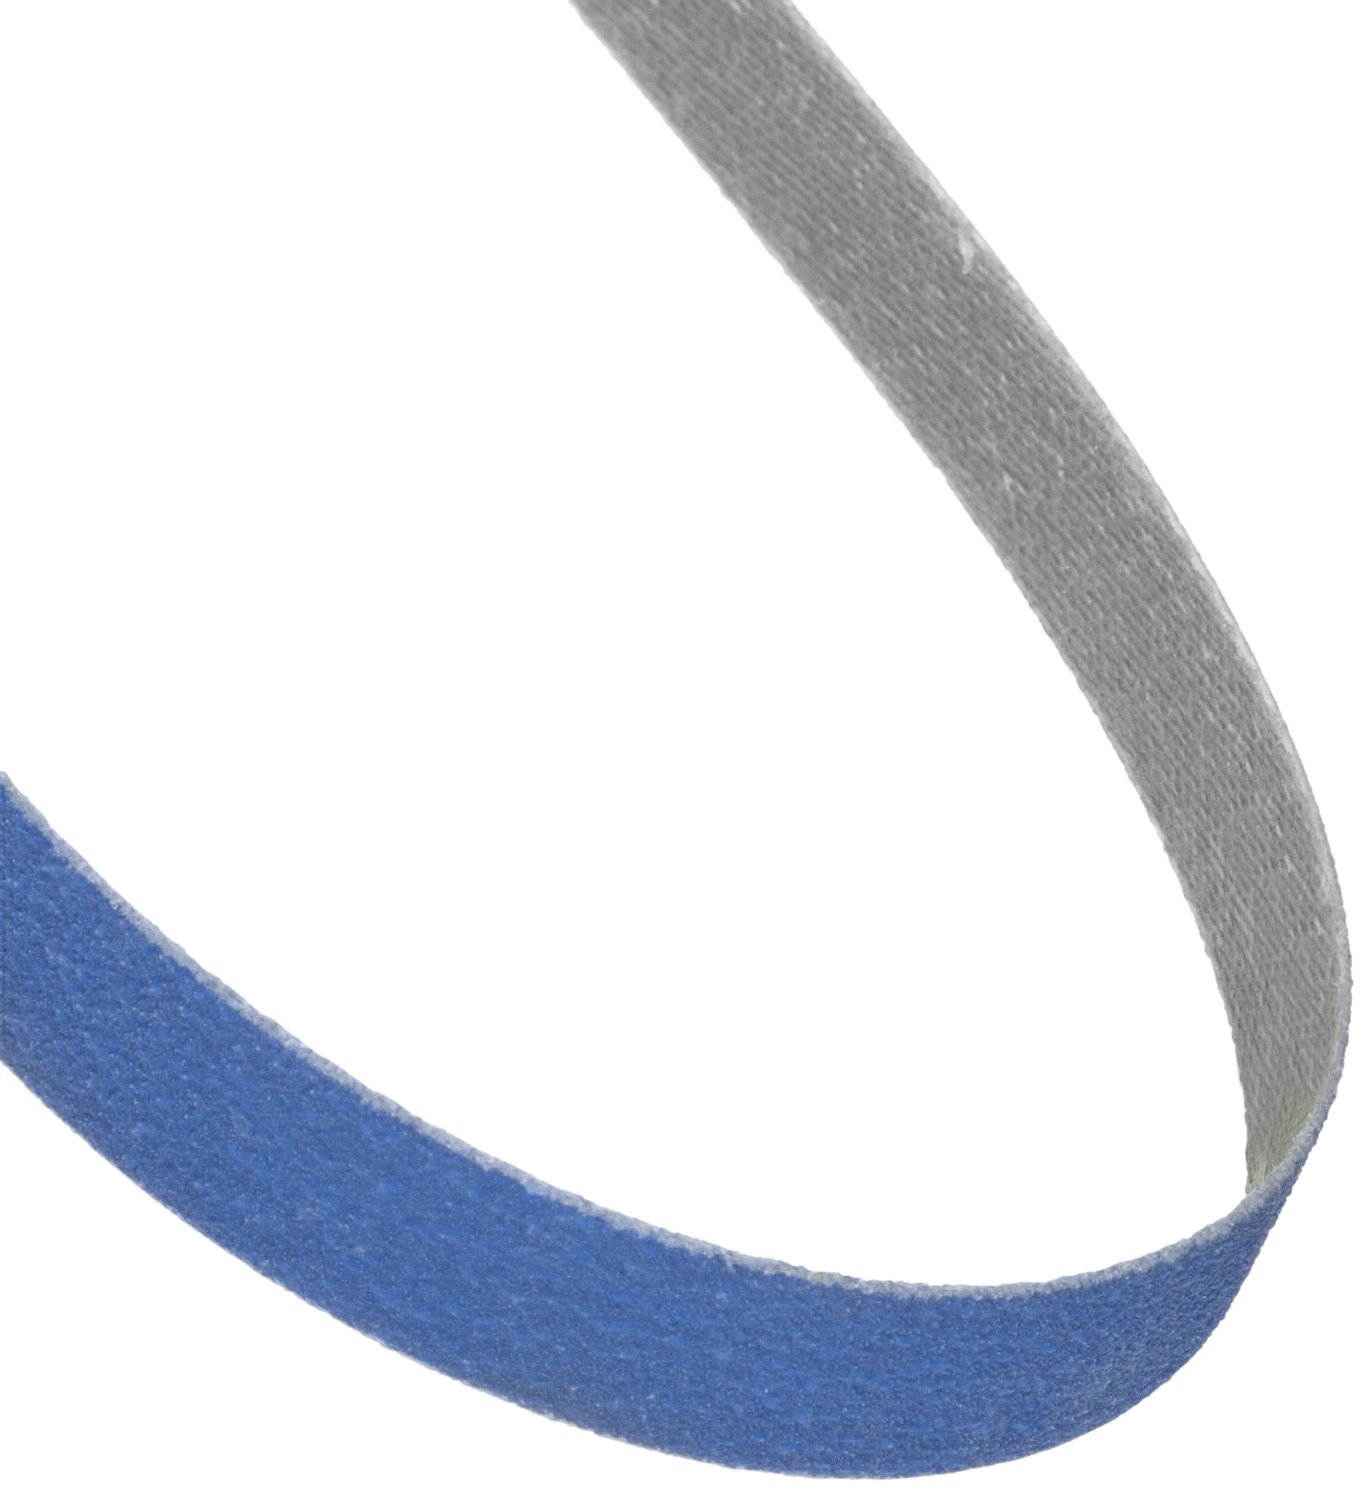 Norton BlueFire R823P File Abrasive Belt, Waterproof, Polyester Backing, Zirconia Alumina, 1/2' Width, 24' Length, Grit 100  (Pack of 10) 1/2 Width 24 Length St. Gobain Abrasives 78072753076